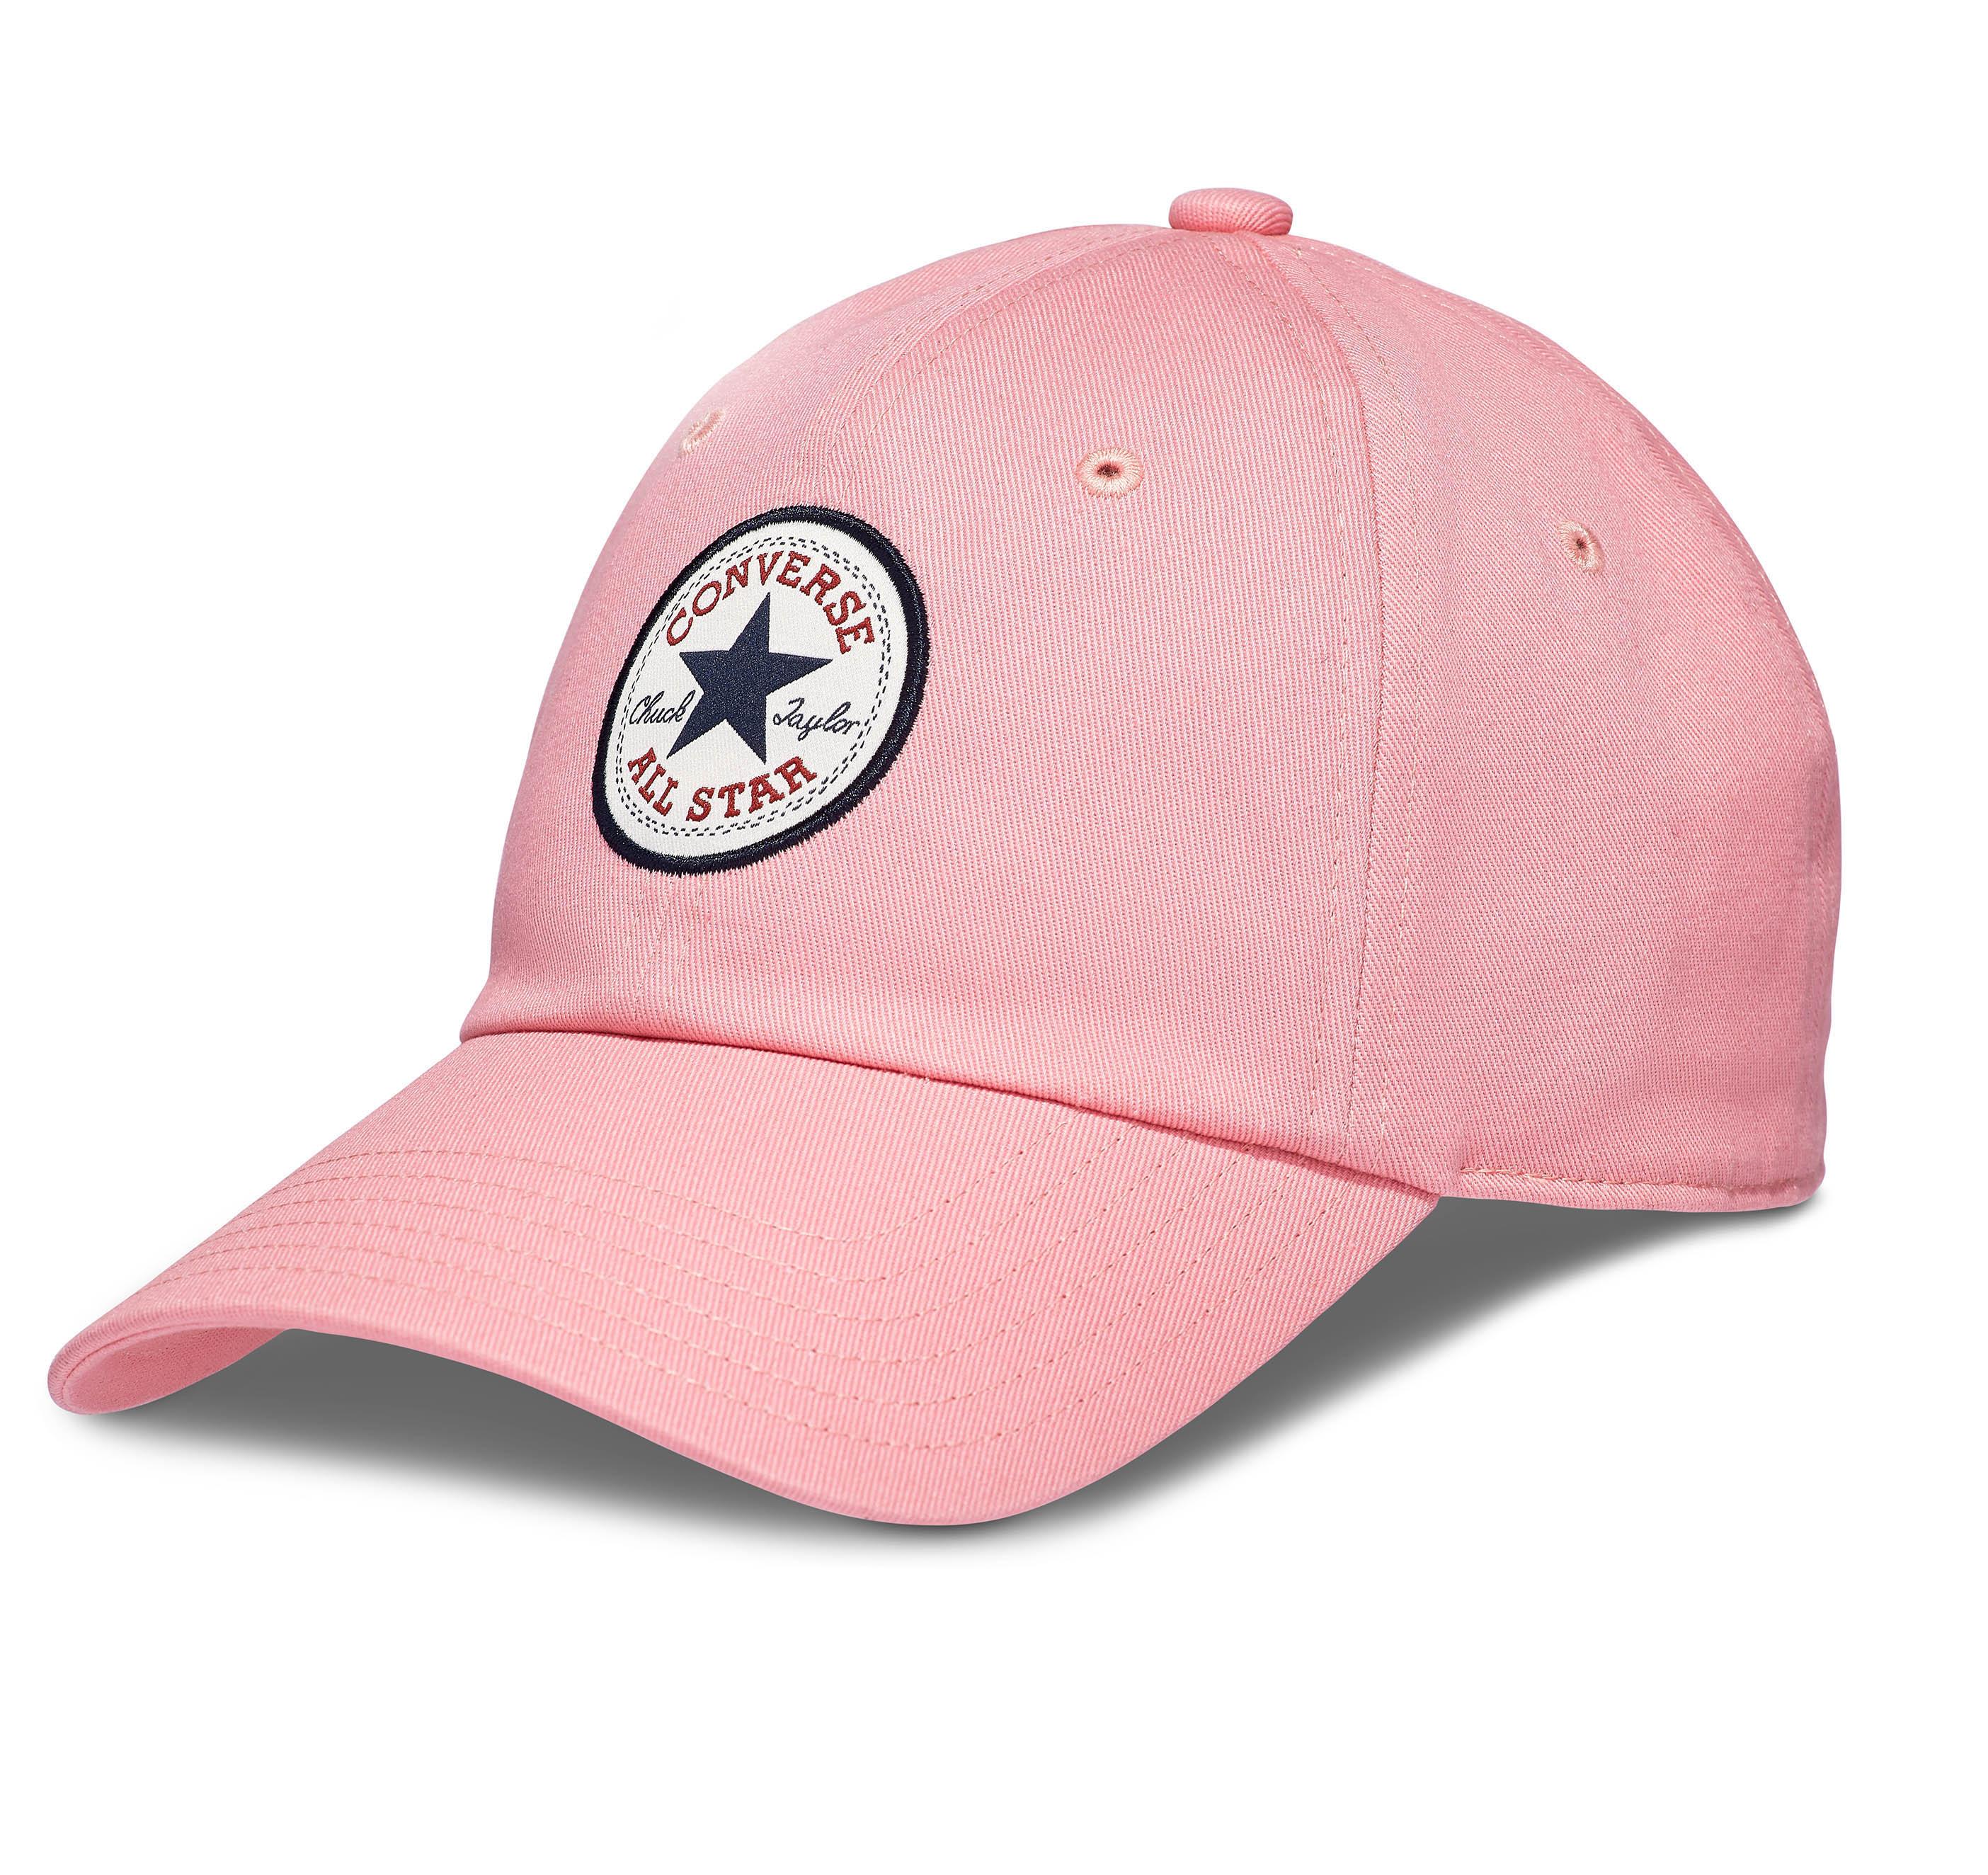 Converse Tipoff Chuck Baseball Strapback Cap Hat Turquoise 10008474-A07-473